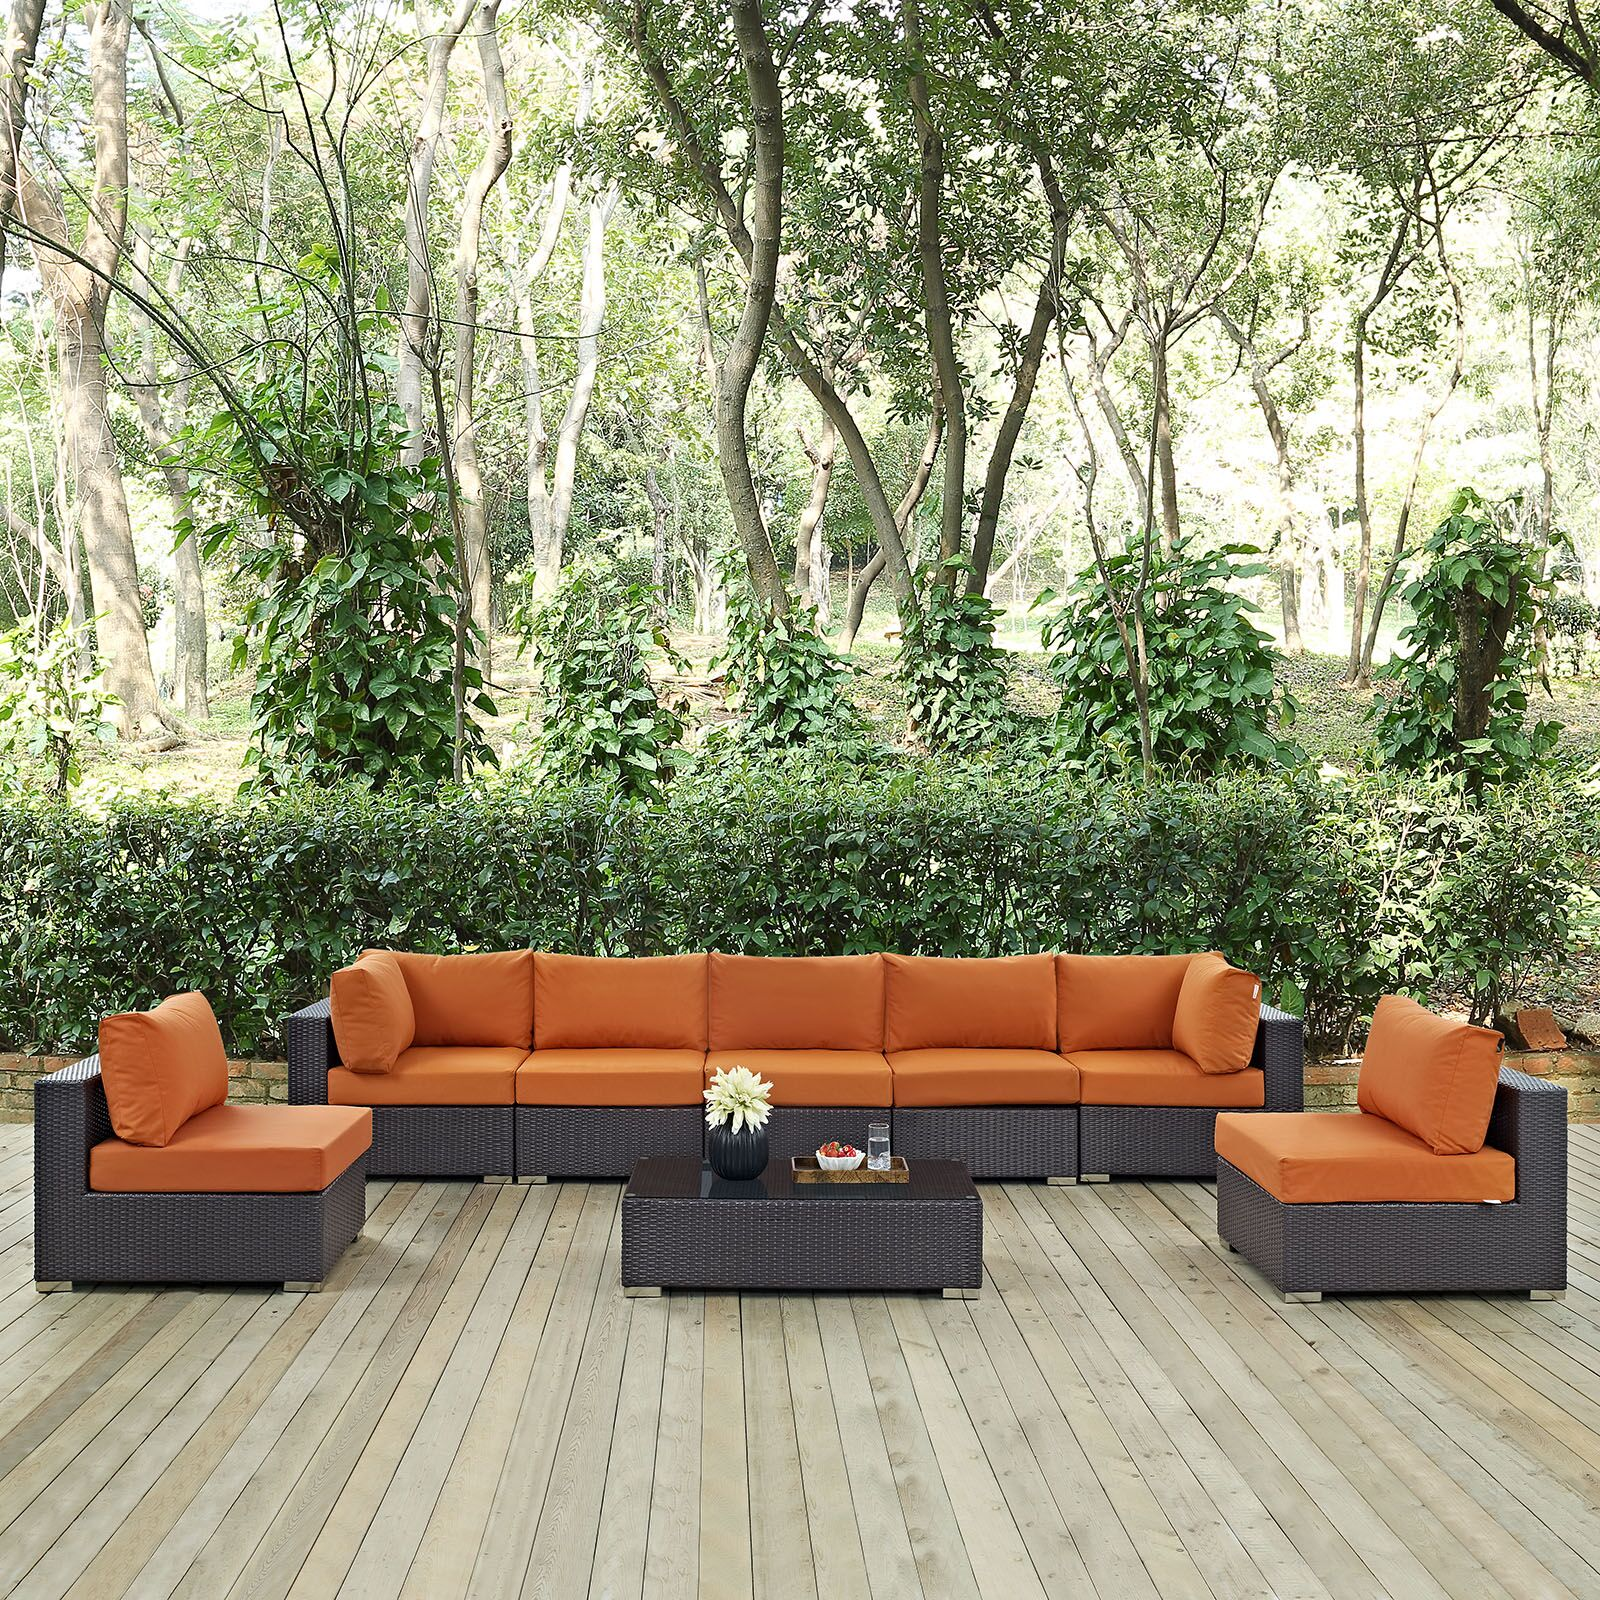 Ryele 8 Piece Rattan Sectional Set with Cushions Fabric: Espresso Orange